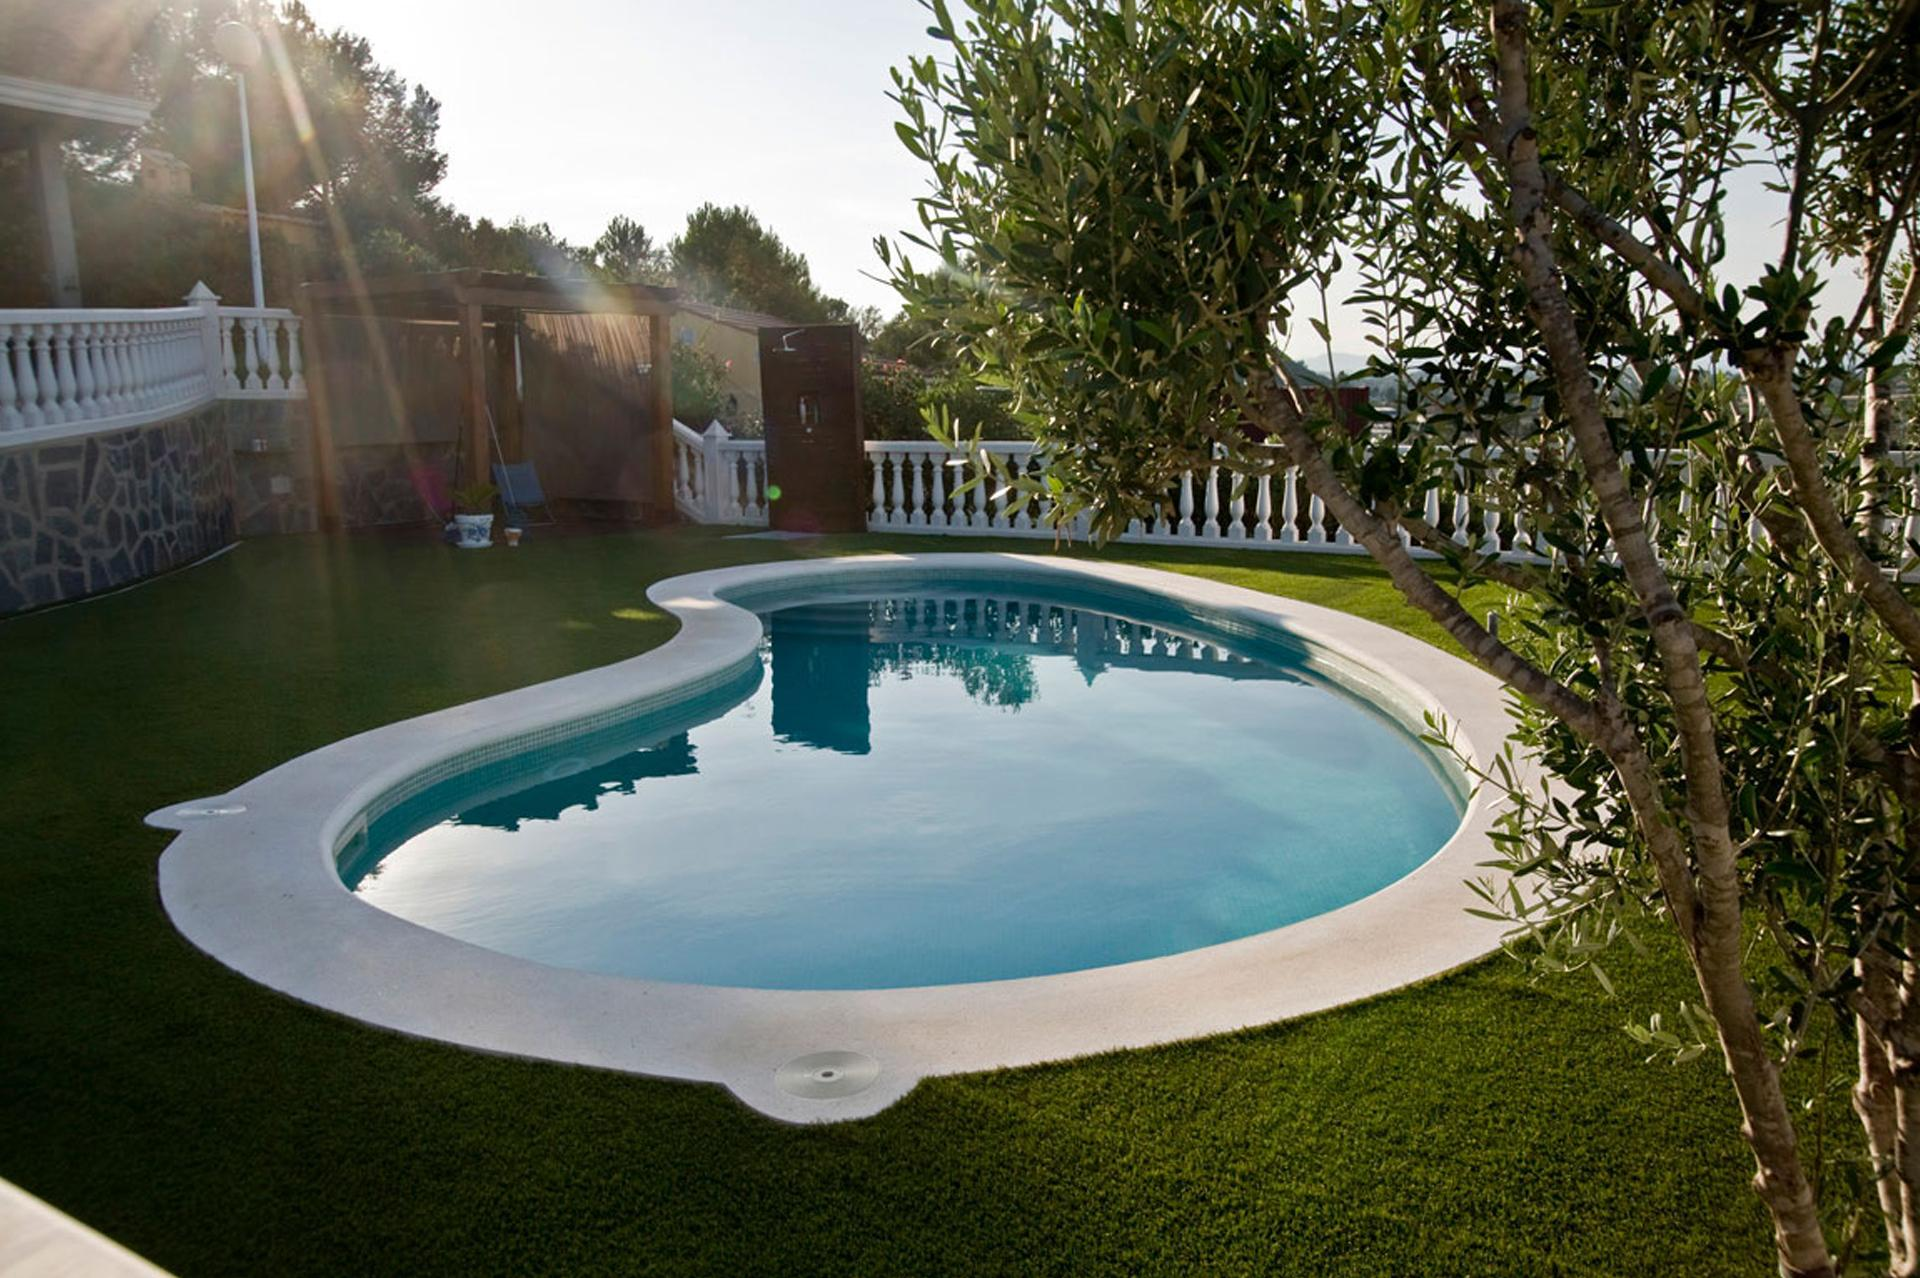 piscina_montserrat_poolplay_6